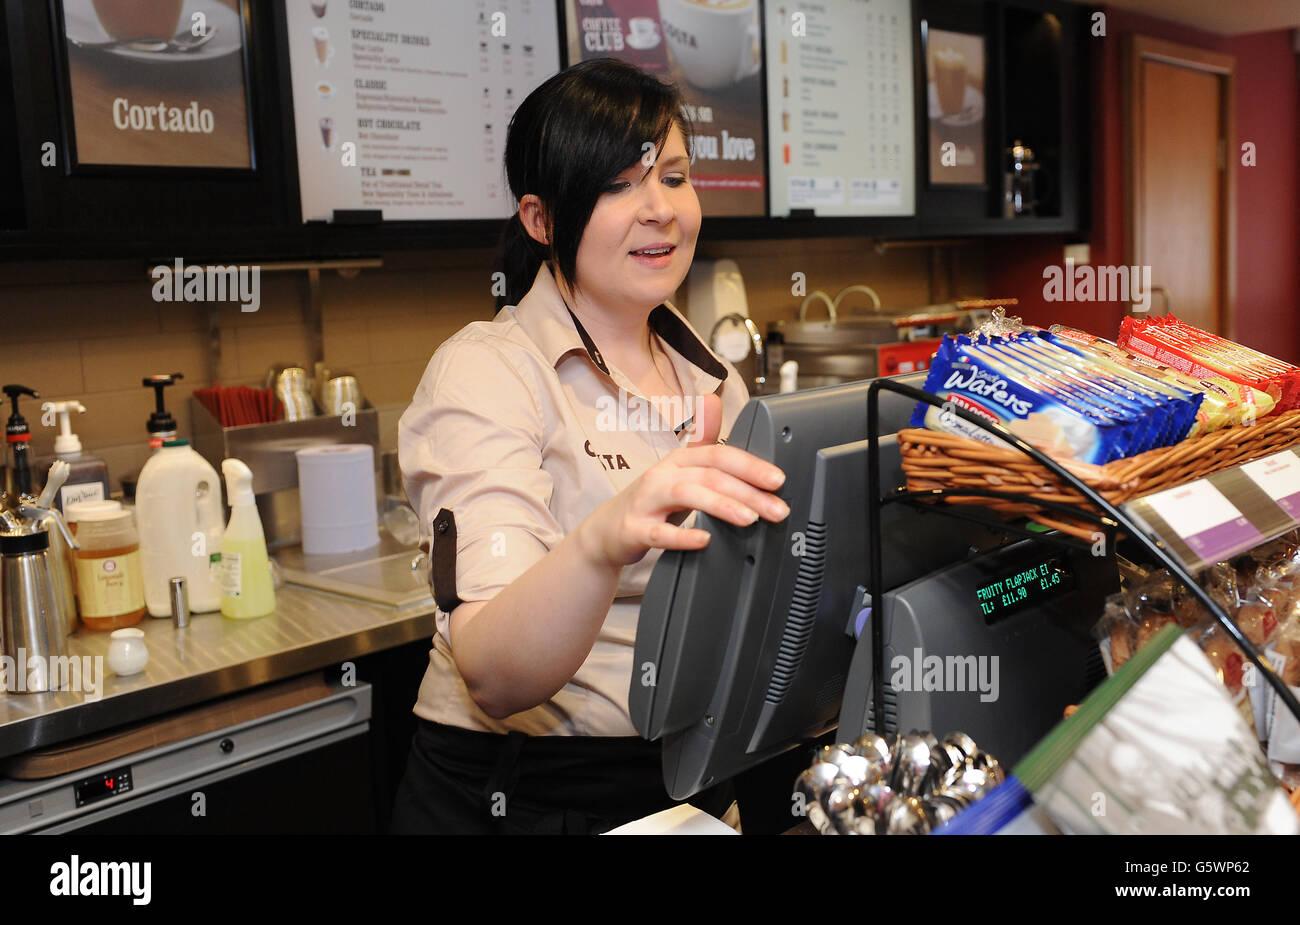 Costa Coffee Jobs Stock Photo 106901706 Alamy